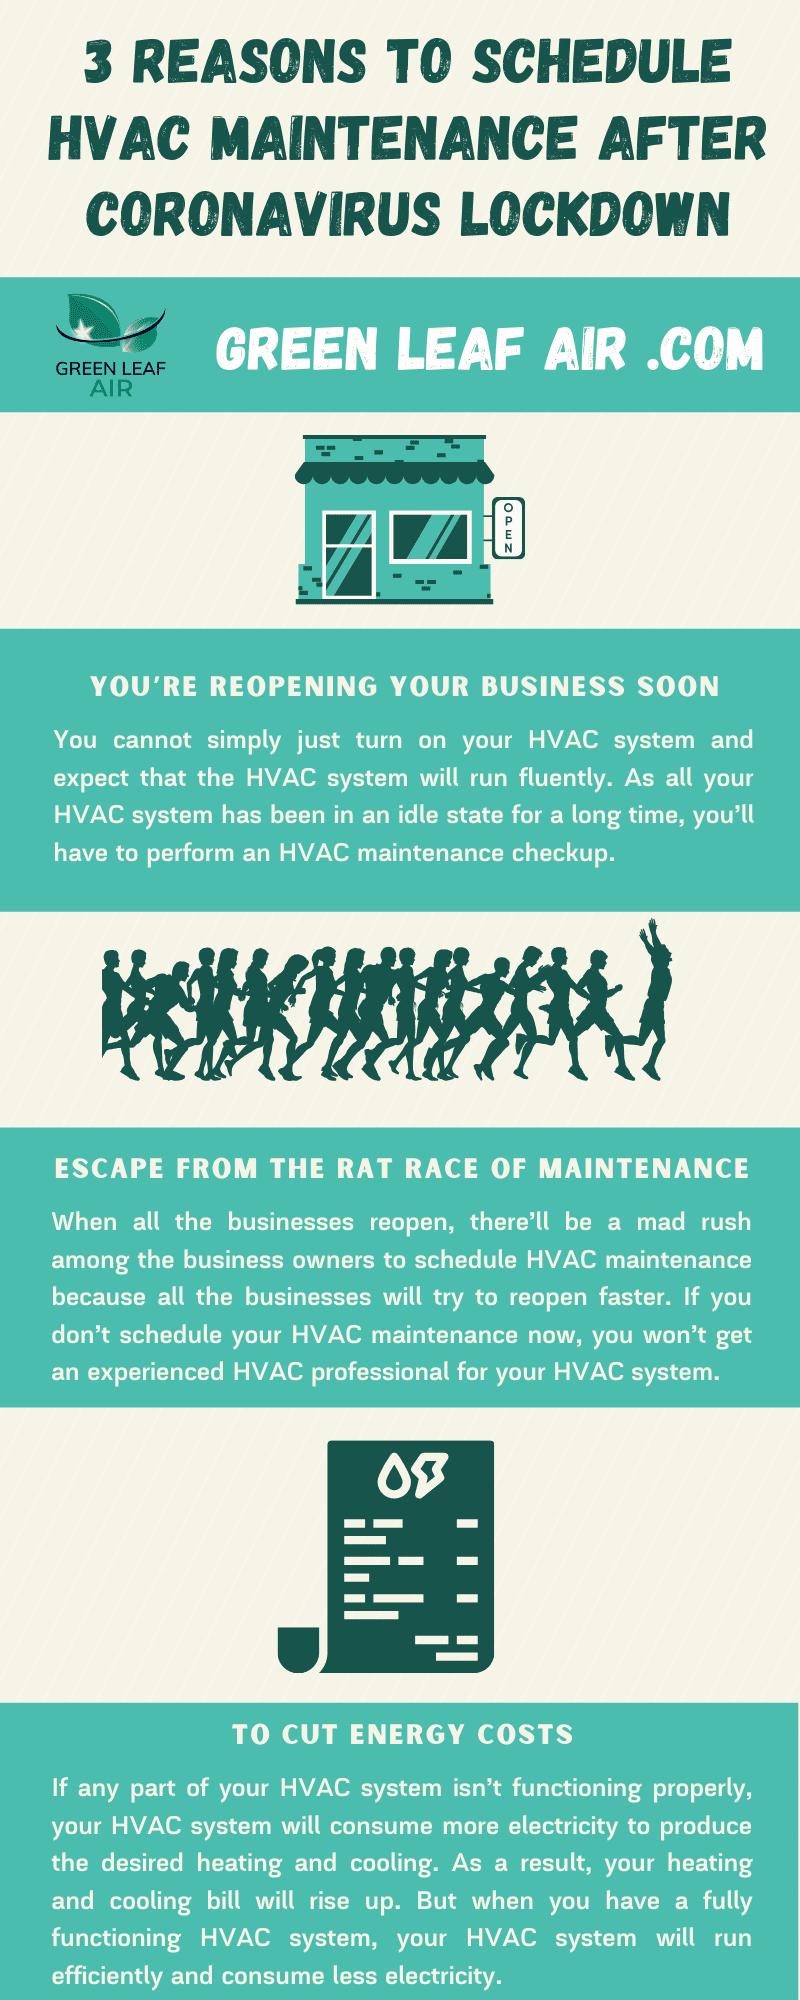 3 Reasons to Schedule HVAC Maintenance After Coronavirus Lockdown